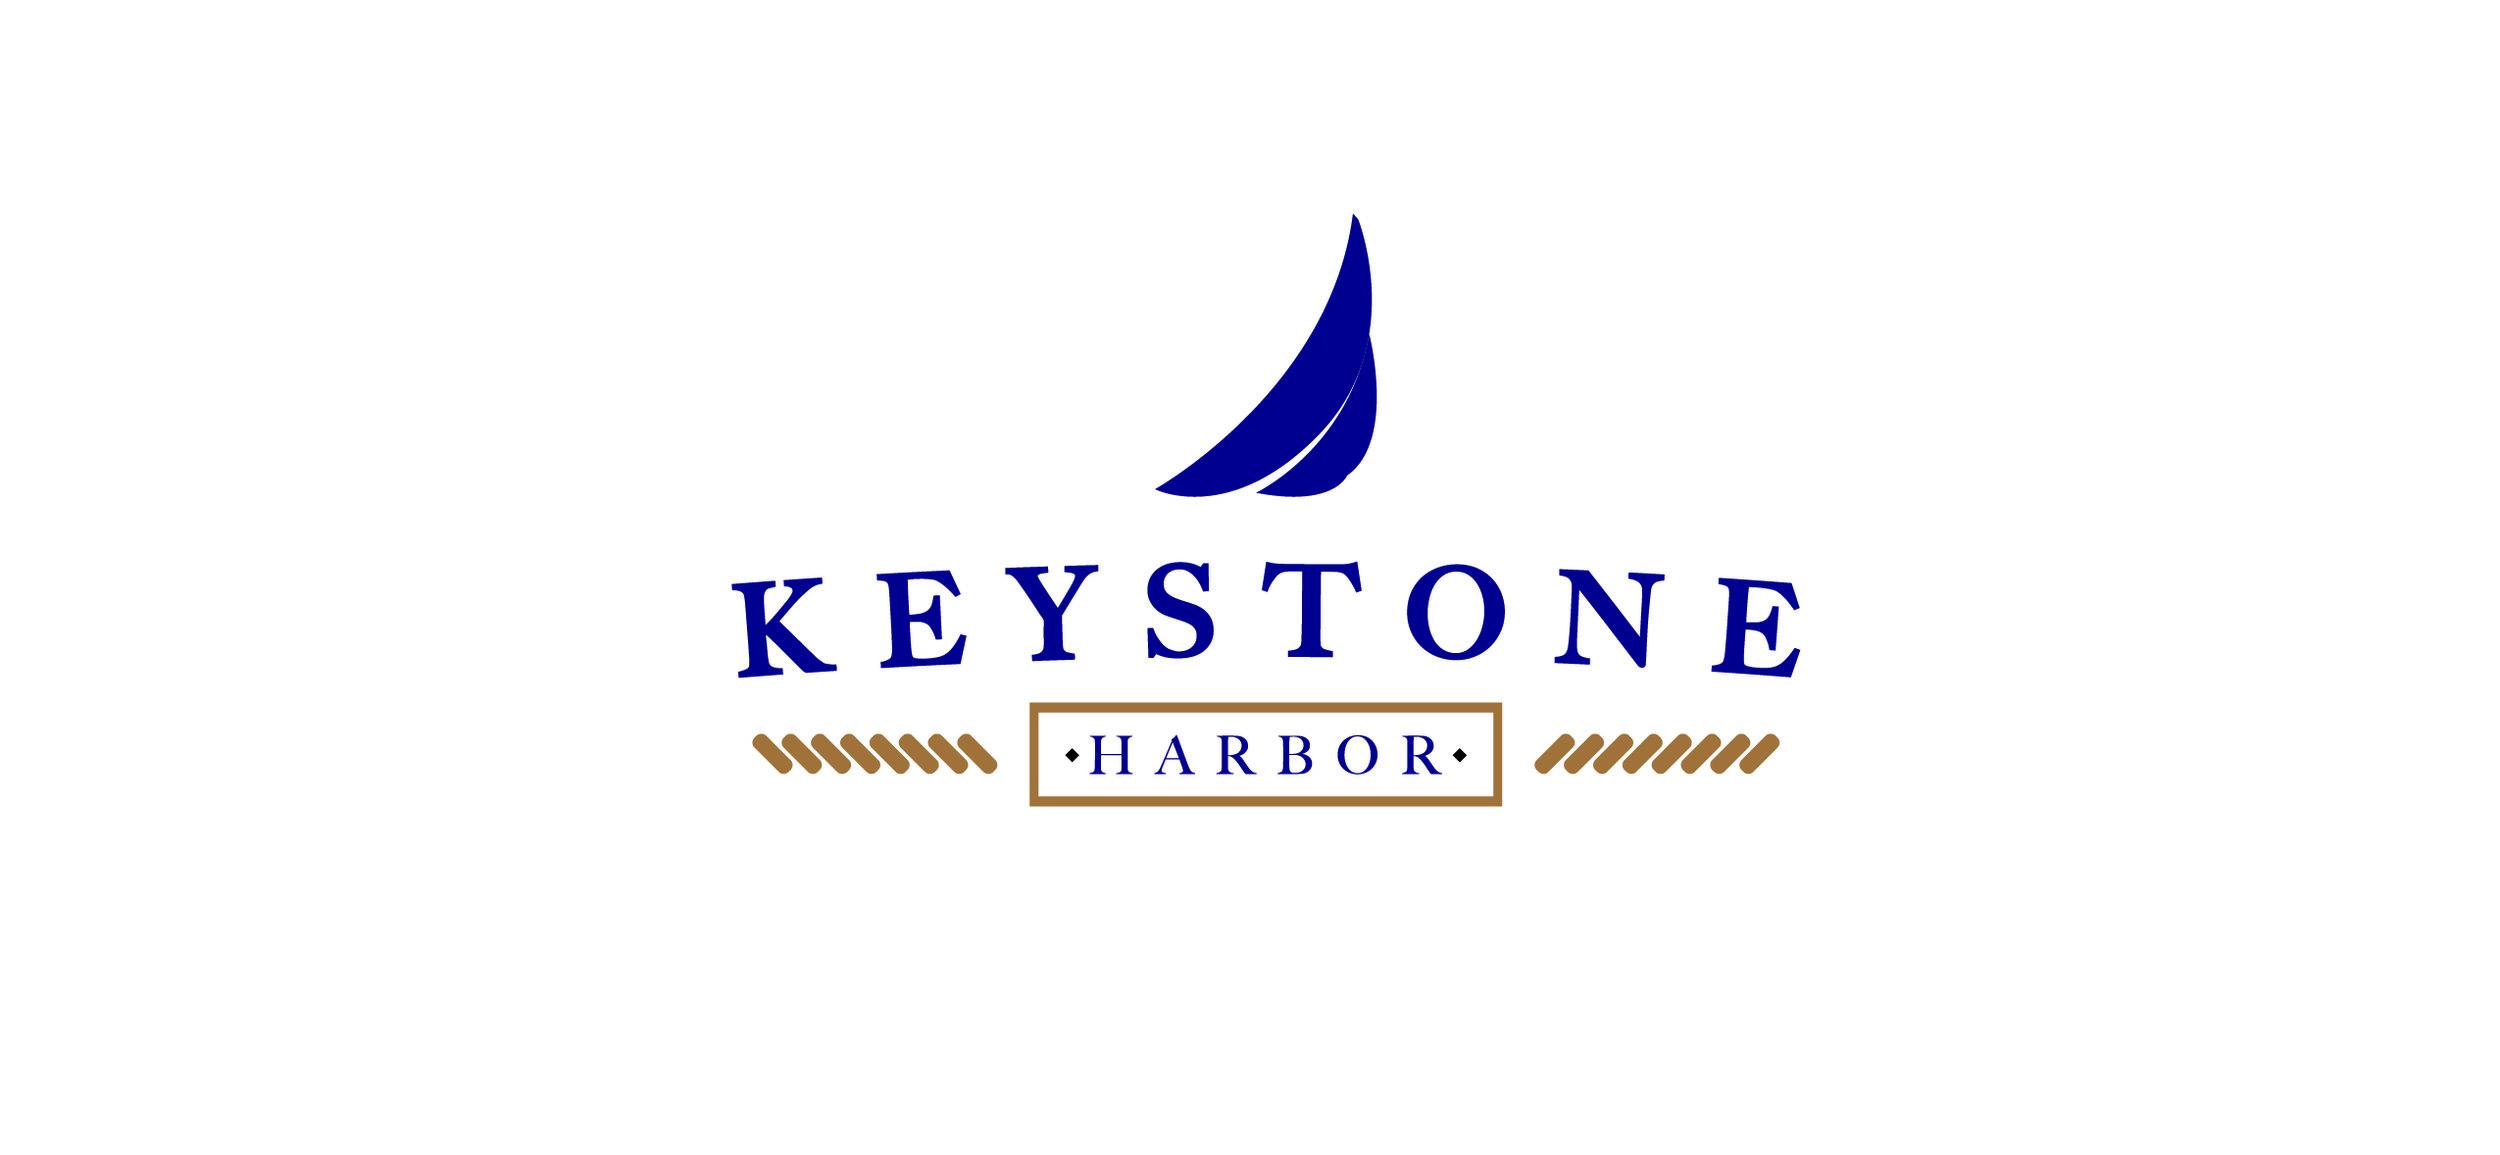 Logo Concepts - Version 2 - Keystone Harbor-01 (002).jpg